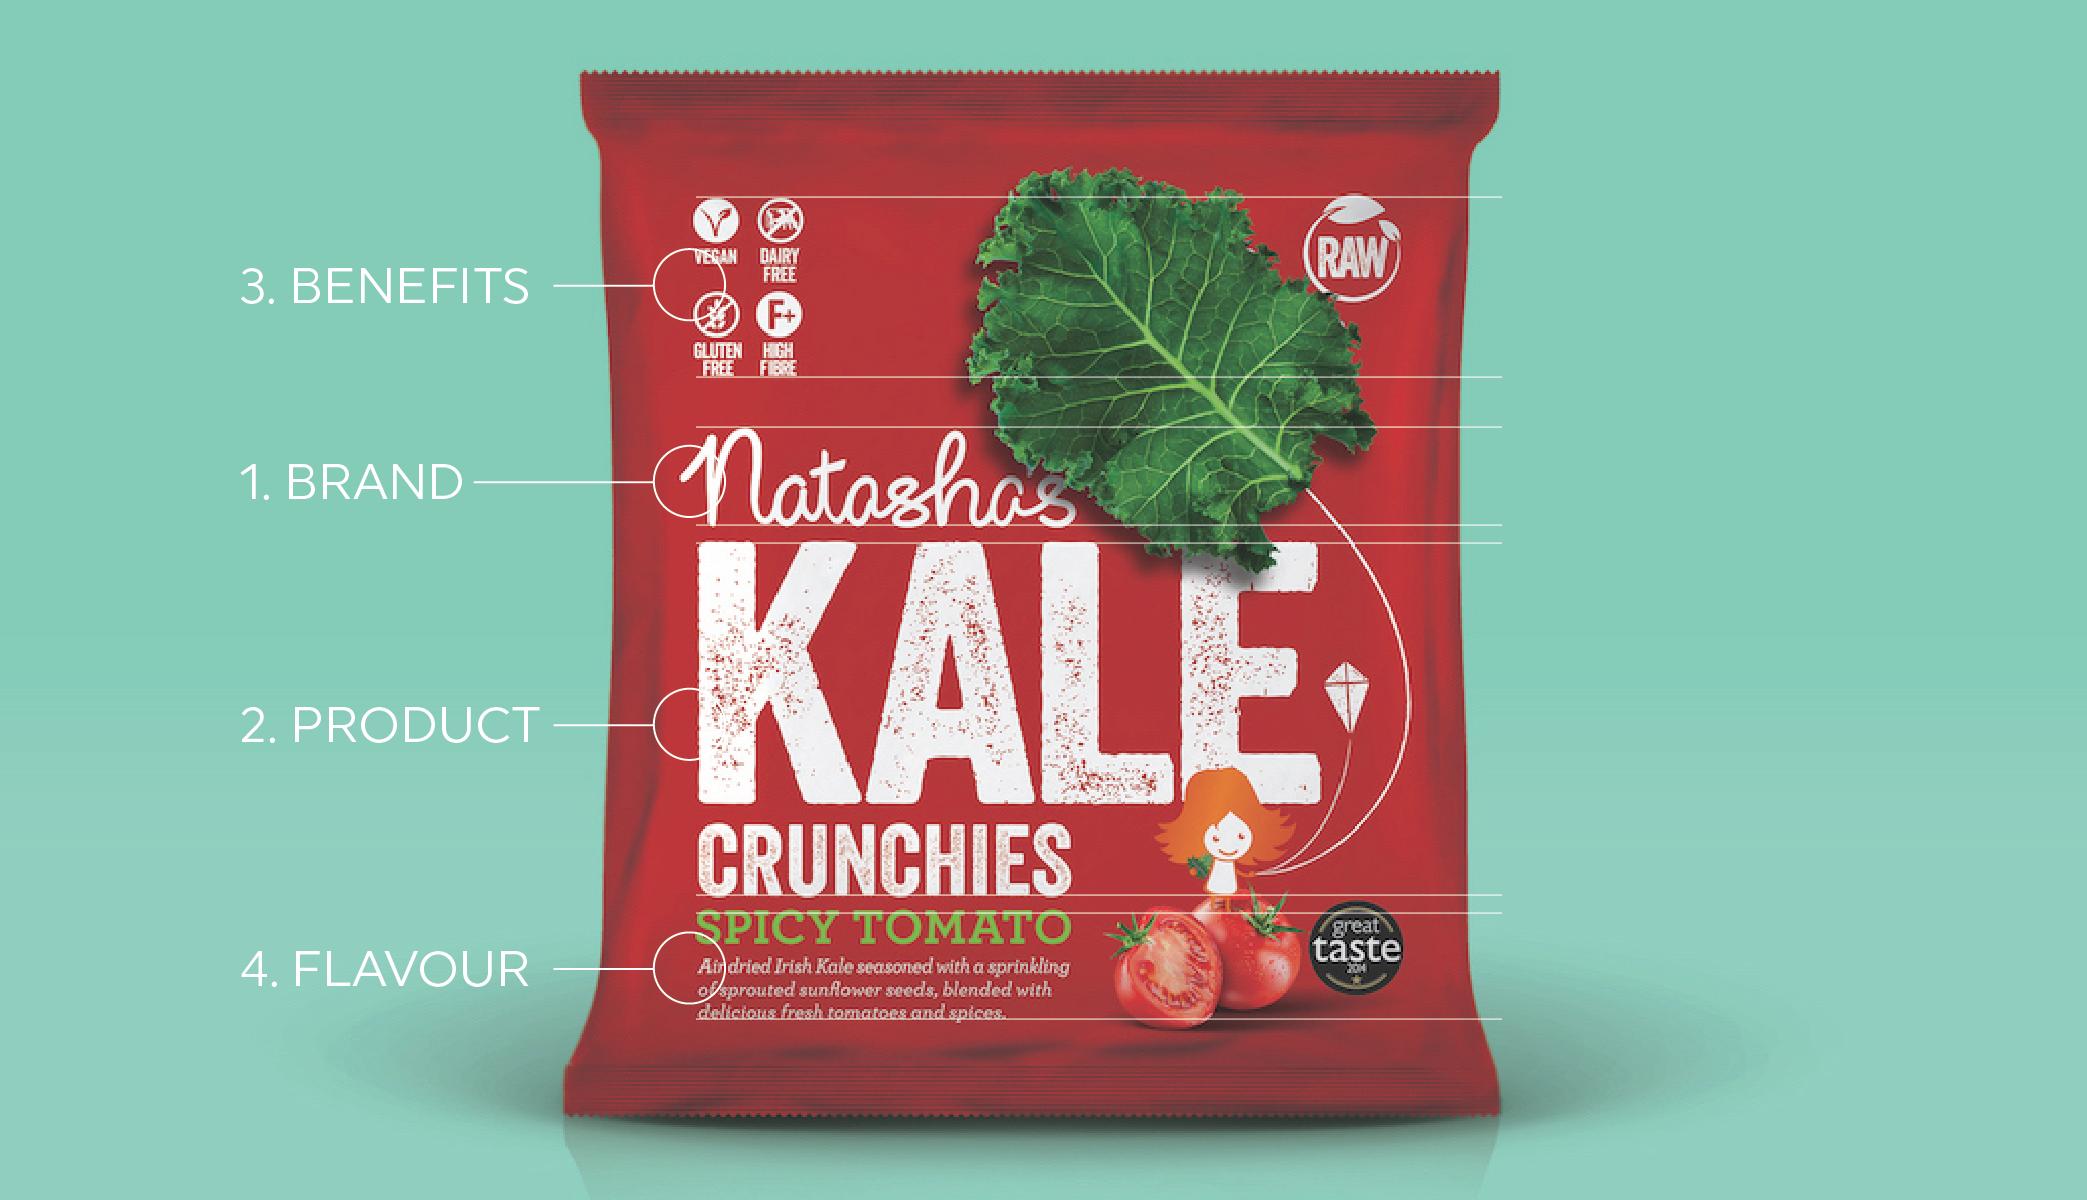 Natasha's Kale branding packaging